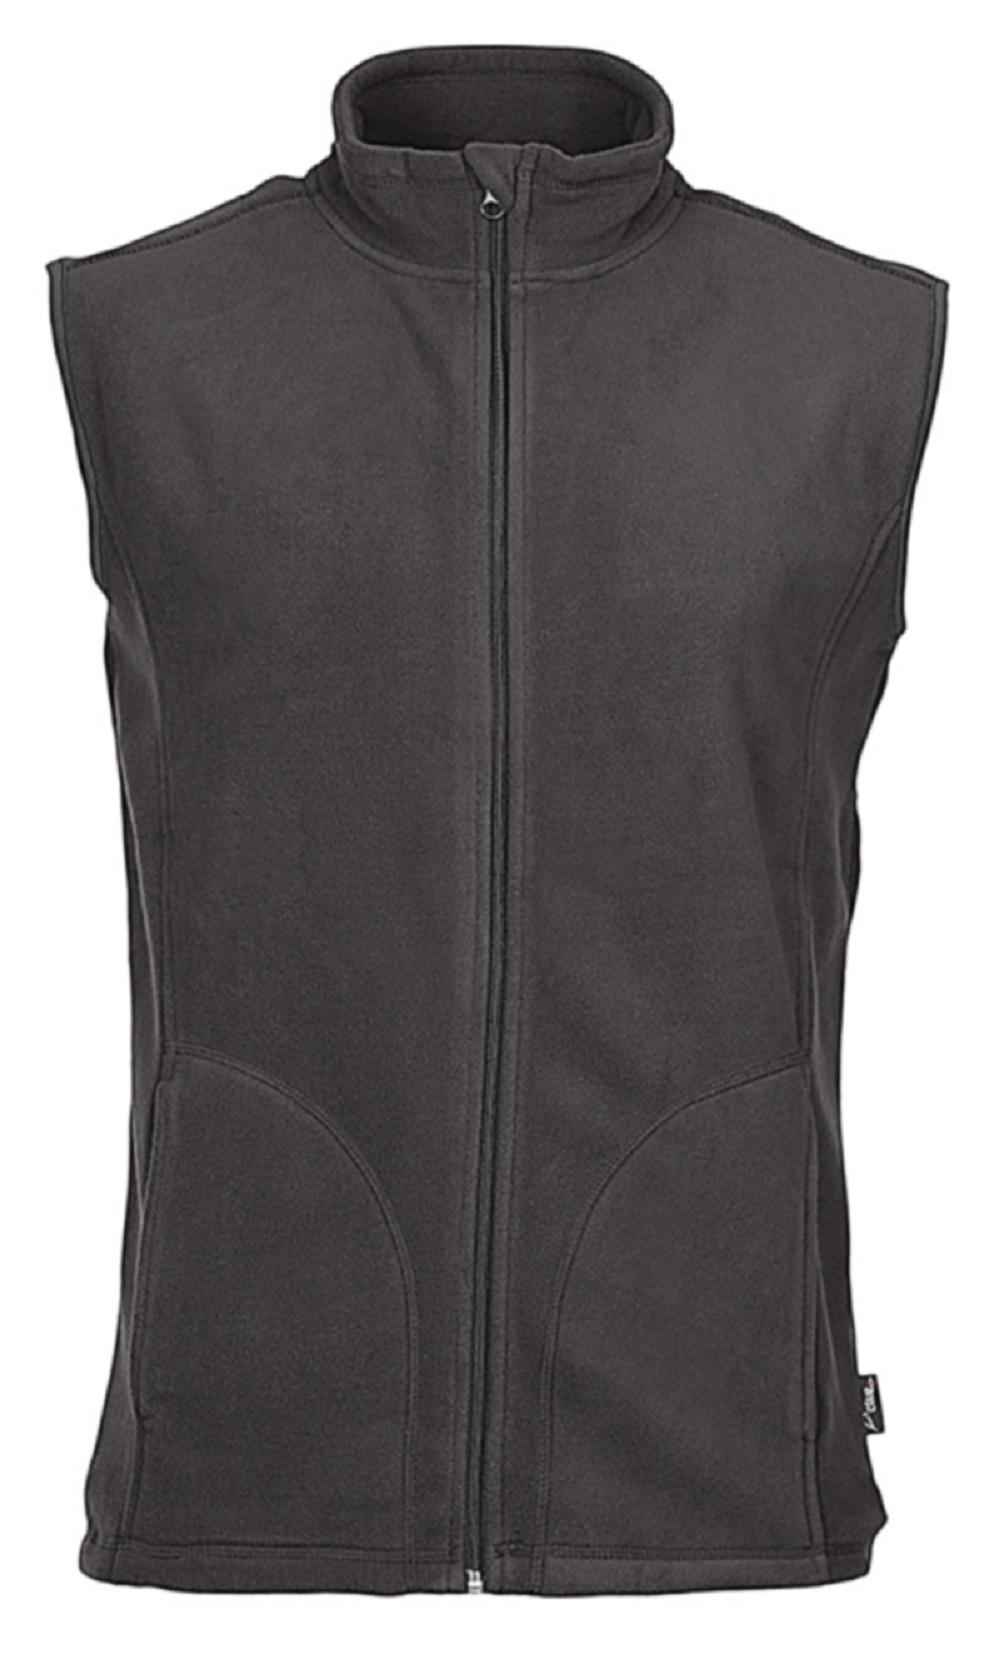 active vest black